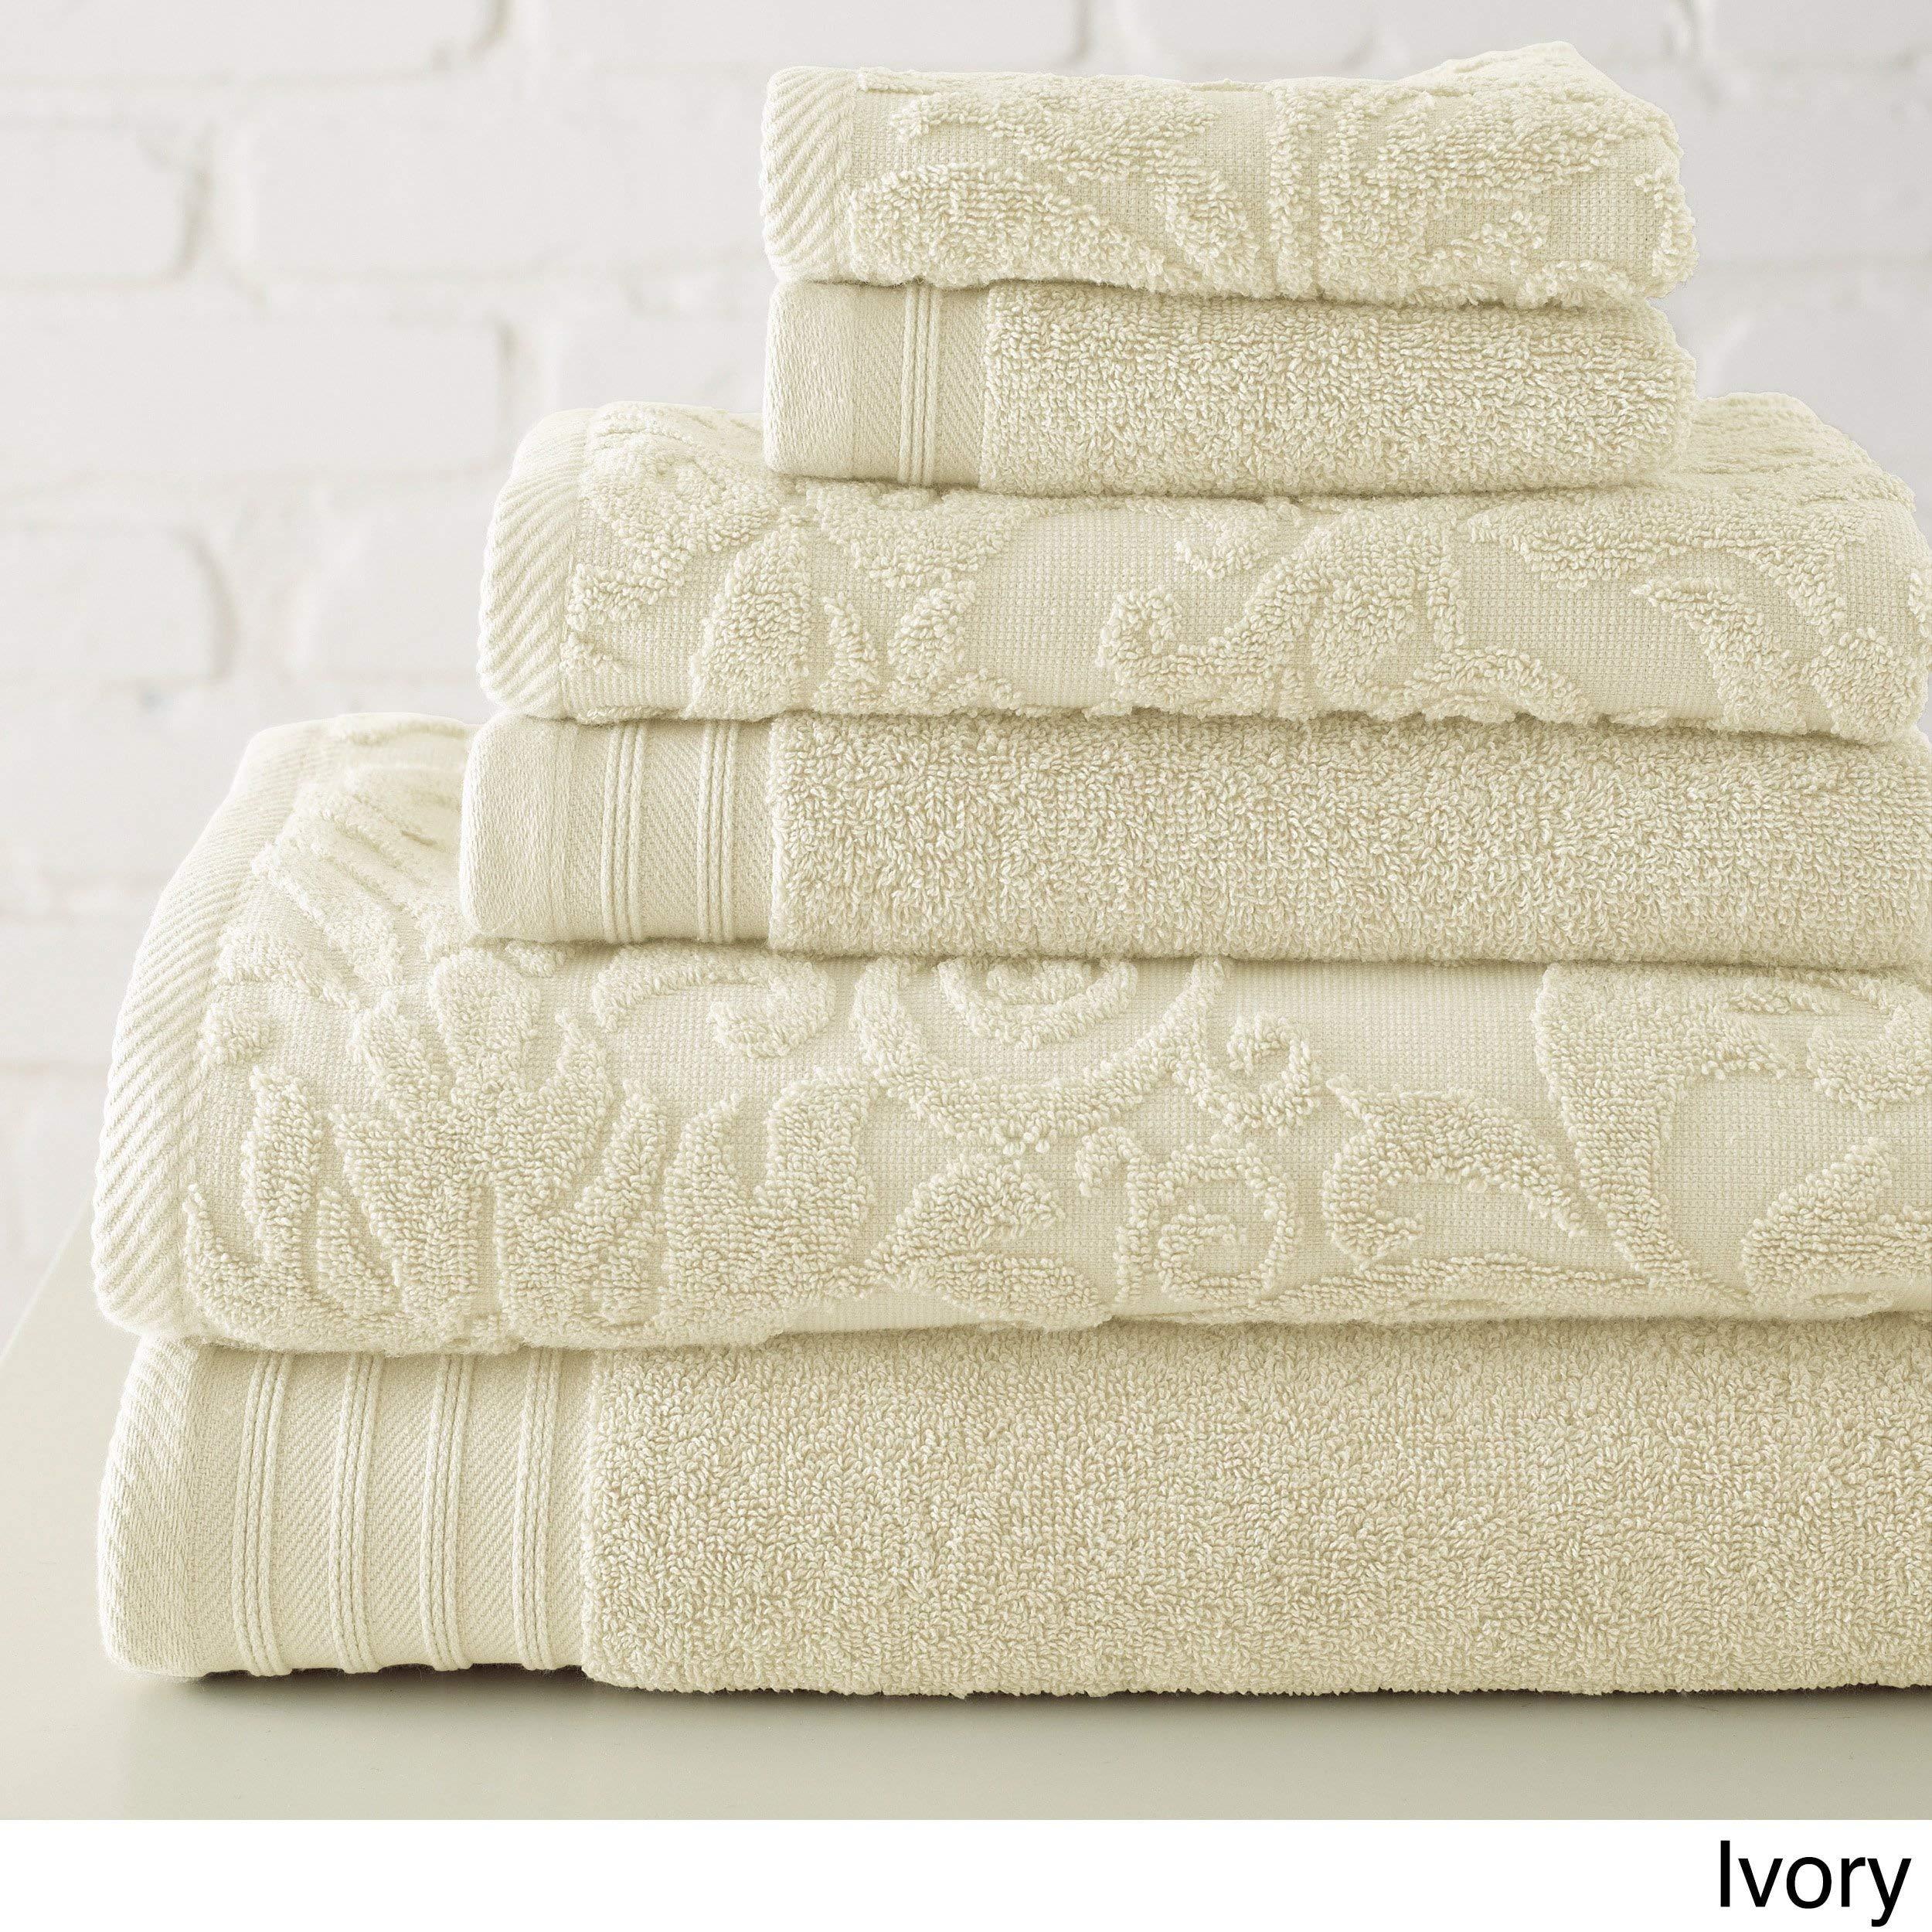 Amrapur Overseas 56JACQLS-Ivy-ST 6 Piece Jacquard/Solid Towel Set Leaf Swirl Ivory, Standard